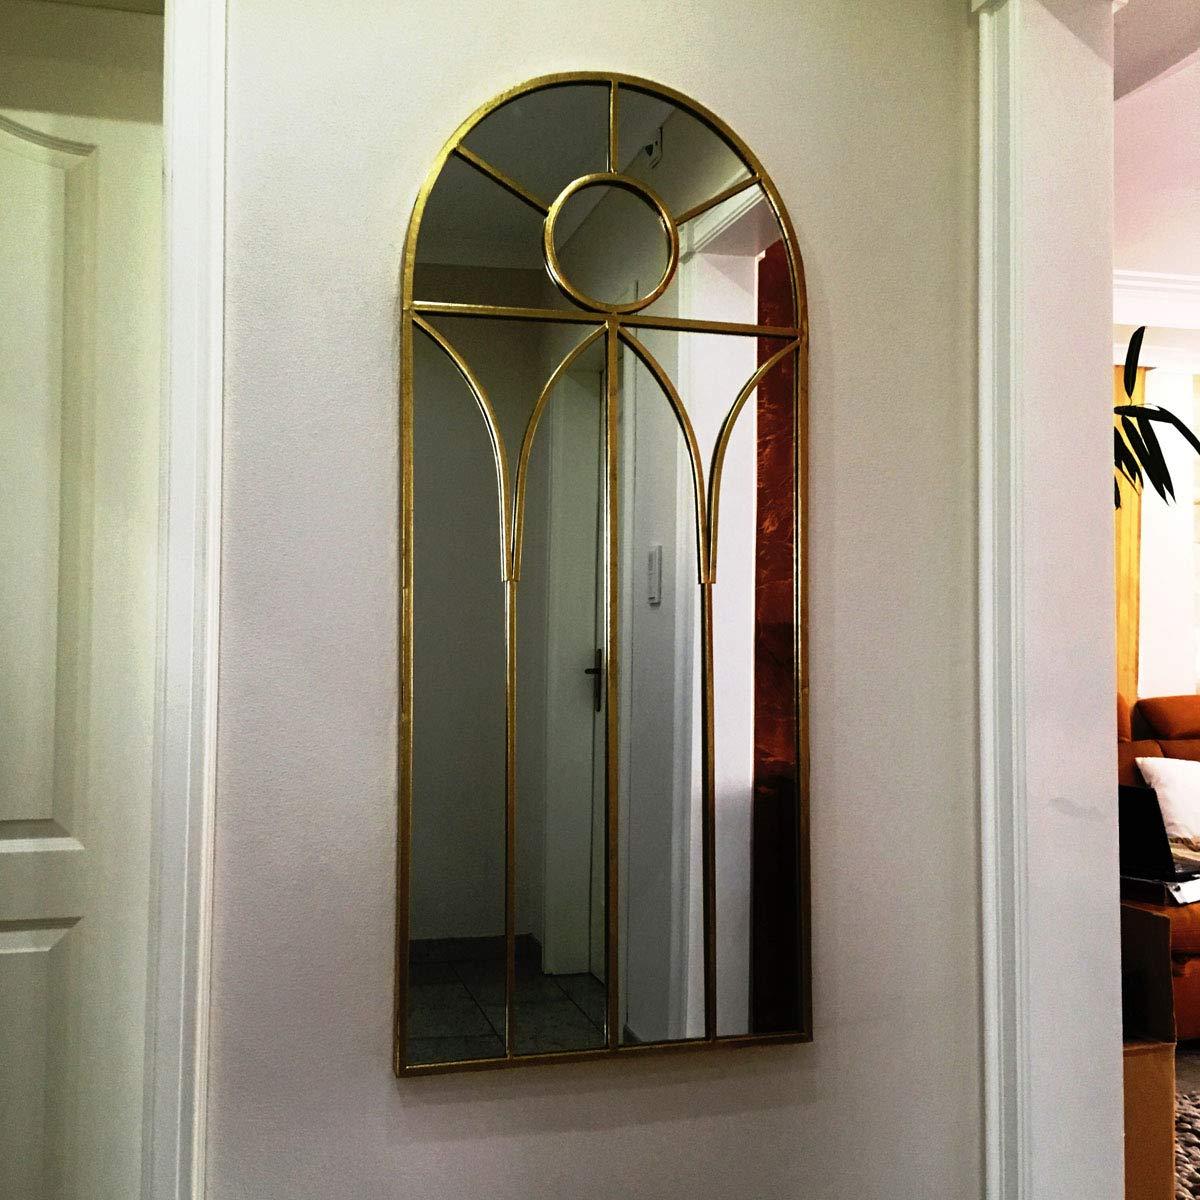 charma nter rústico madera espejo de pared 18 - 3 Espejo ...